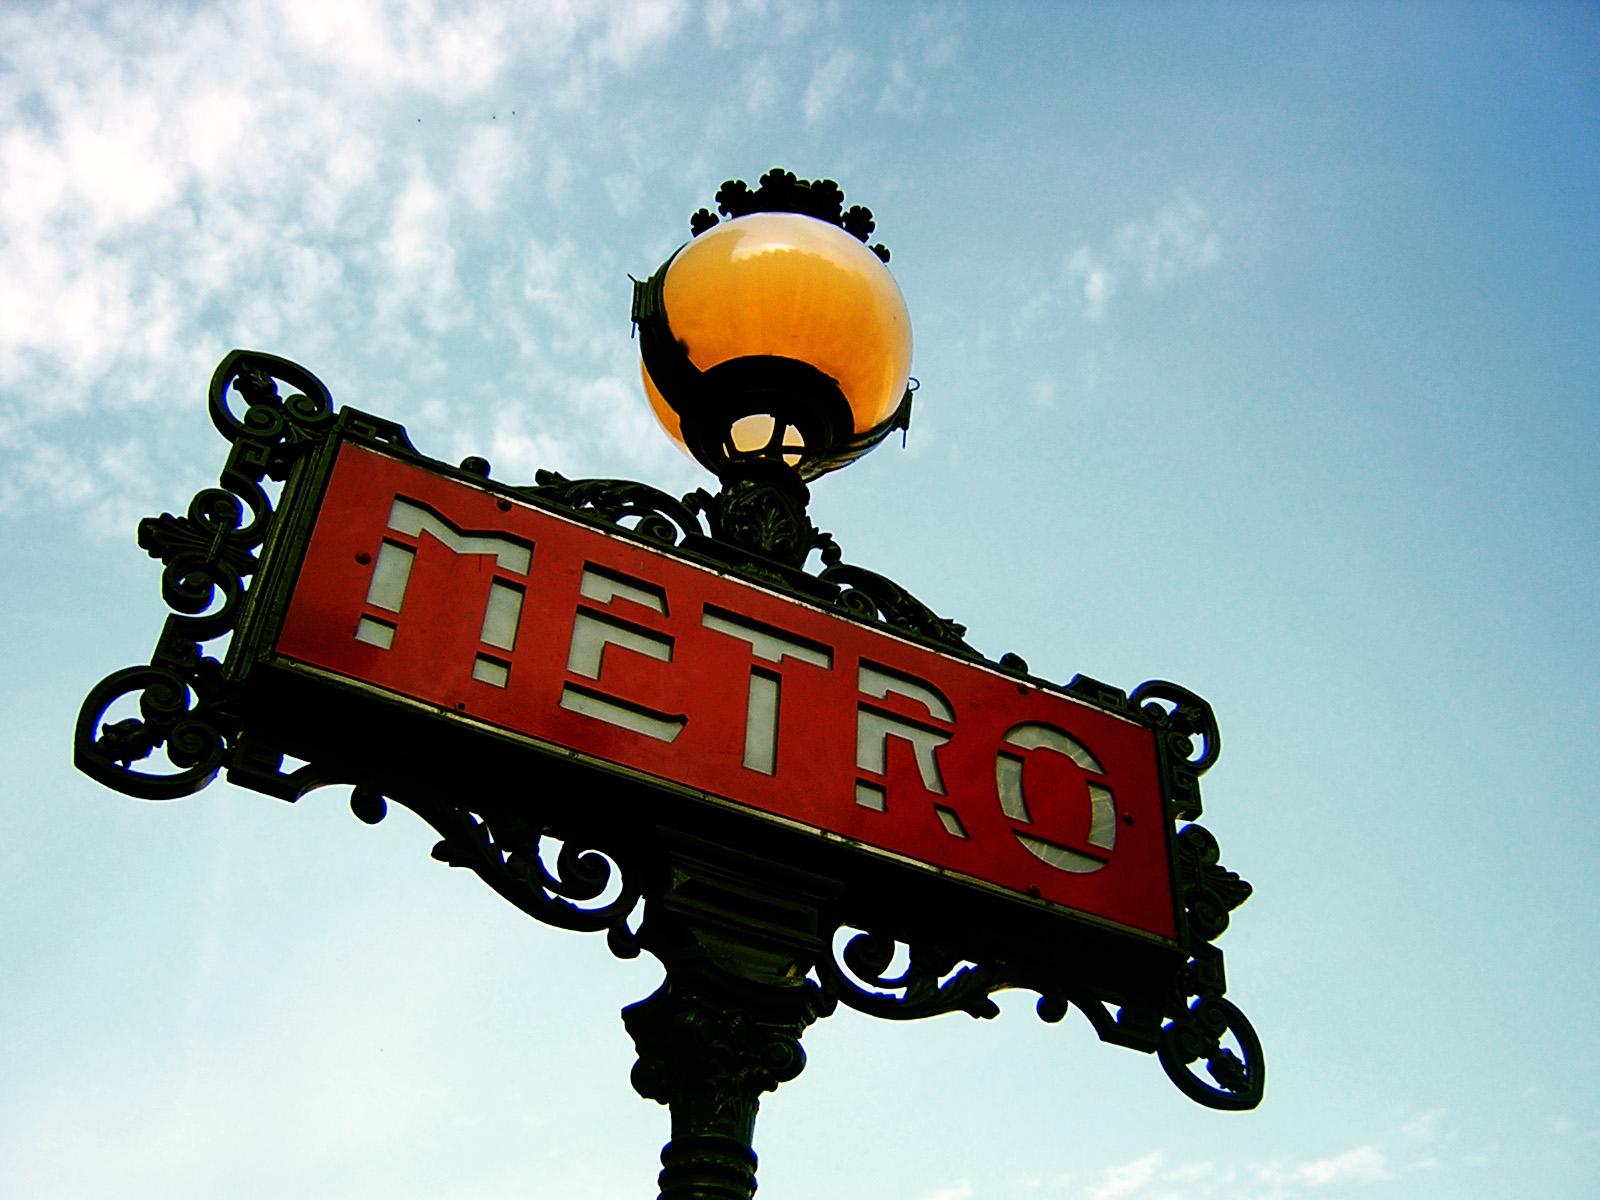 http://upload.wikimedia.org/wikipedia/commons/6/66/Paris_Metro_Sign.jpg